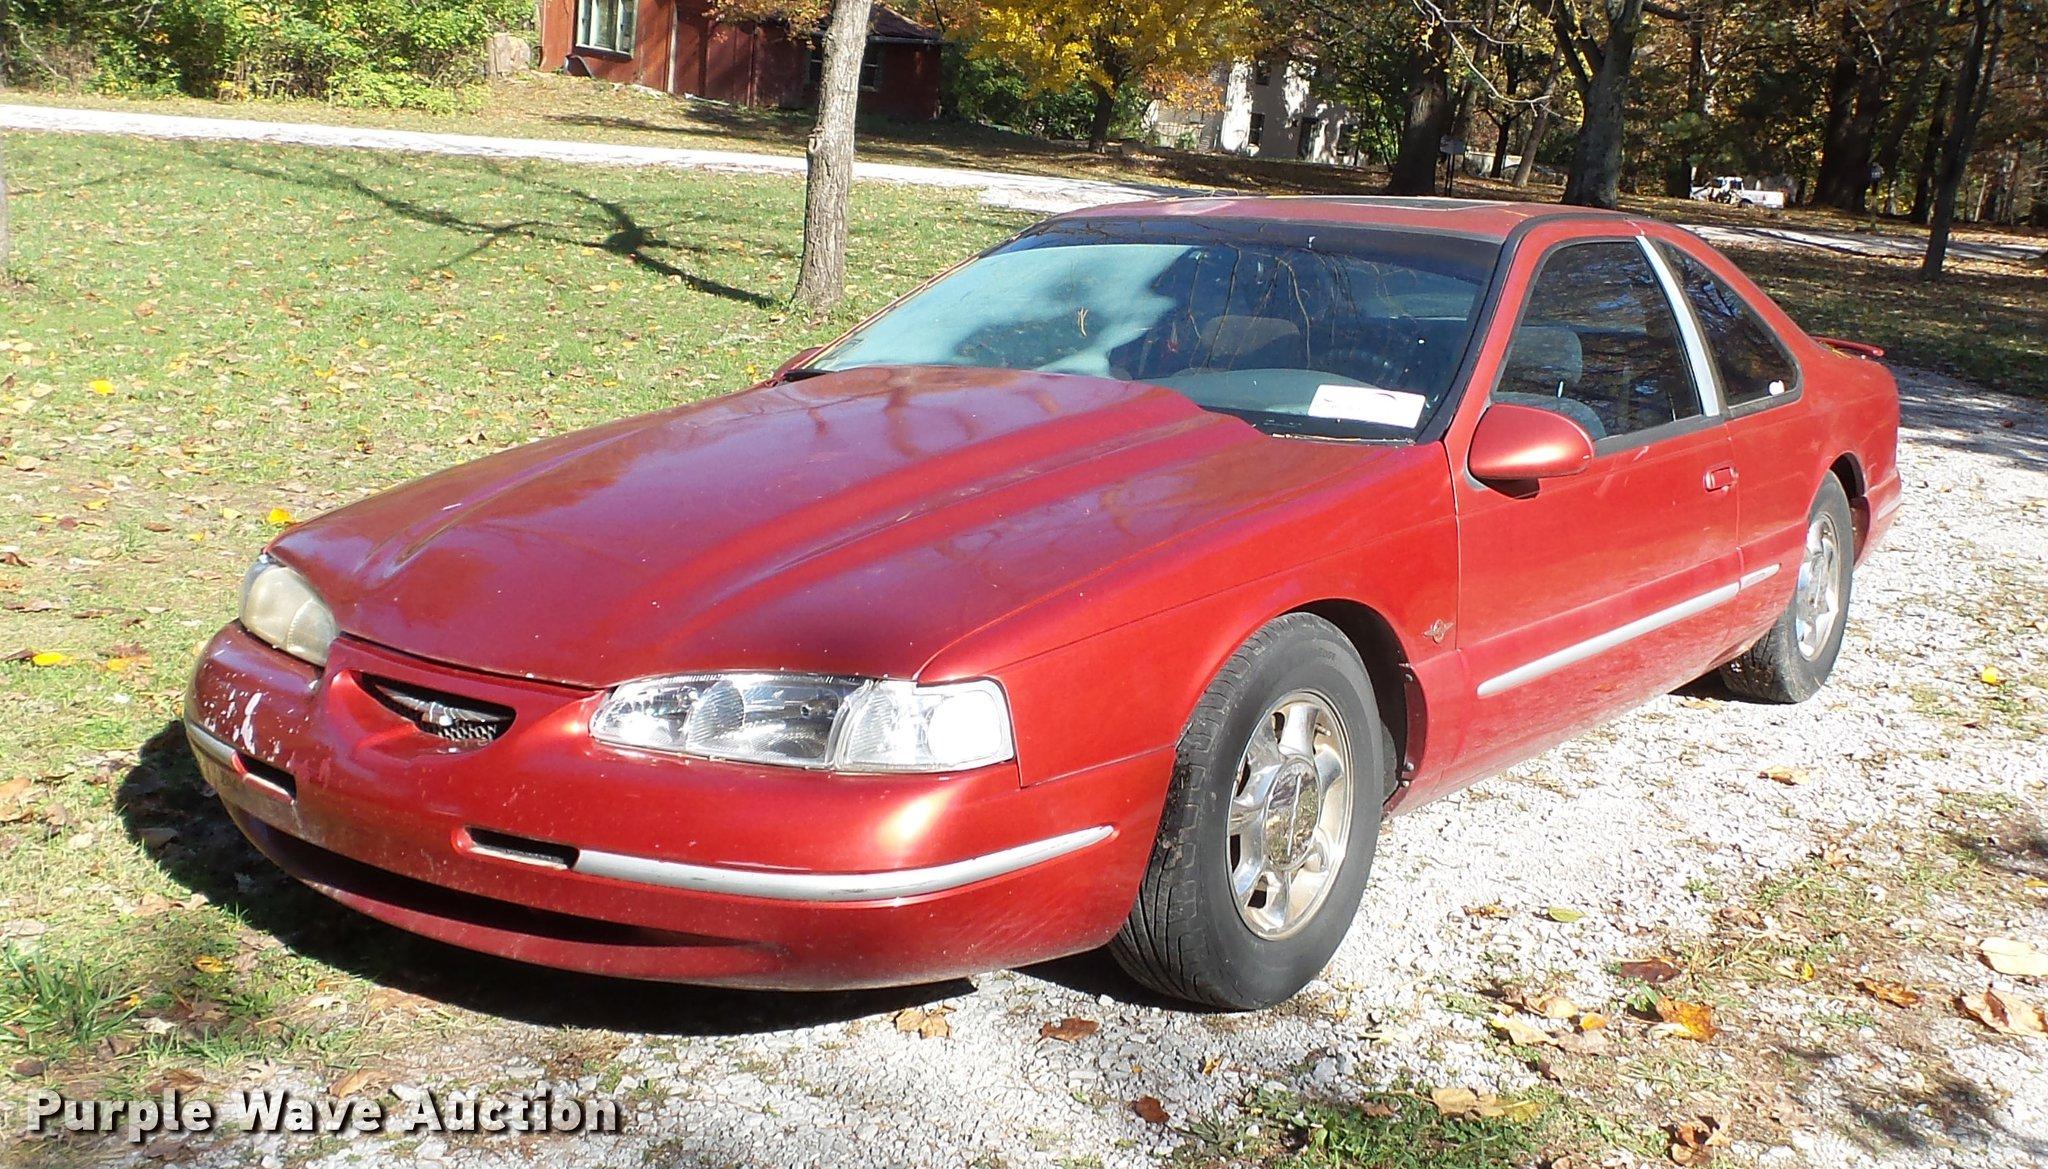 1997 Ford Thunderbird Item DA2428